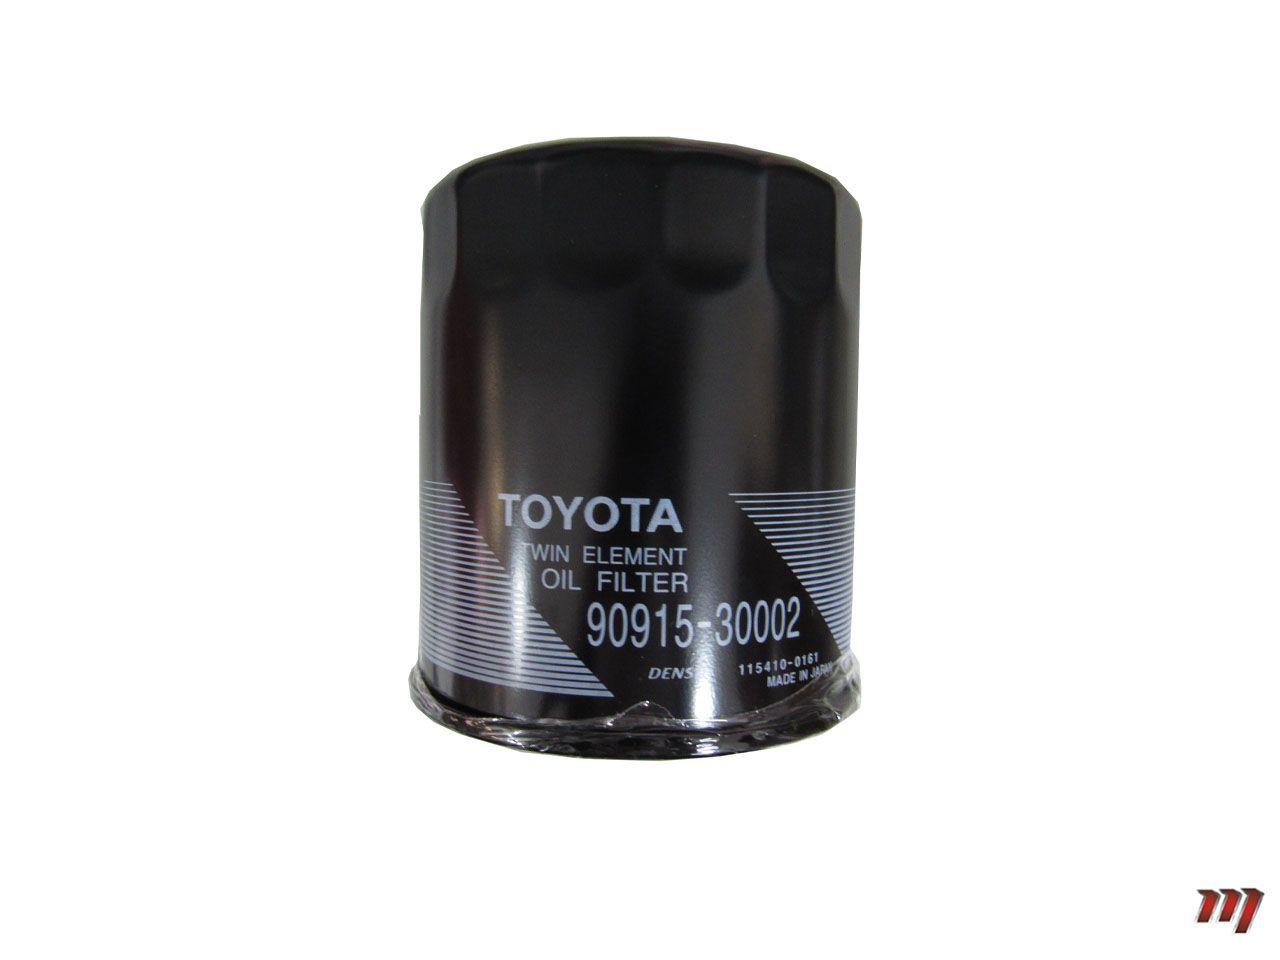 Filtro de Óleo Hilux 4X4 3.0 DIESEL 2001 a 2004  - Mirai Peças Toyota